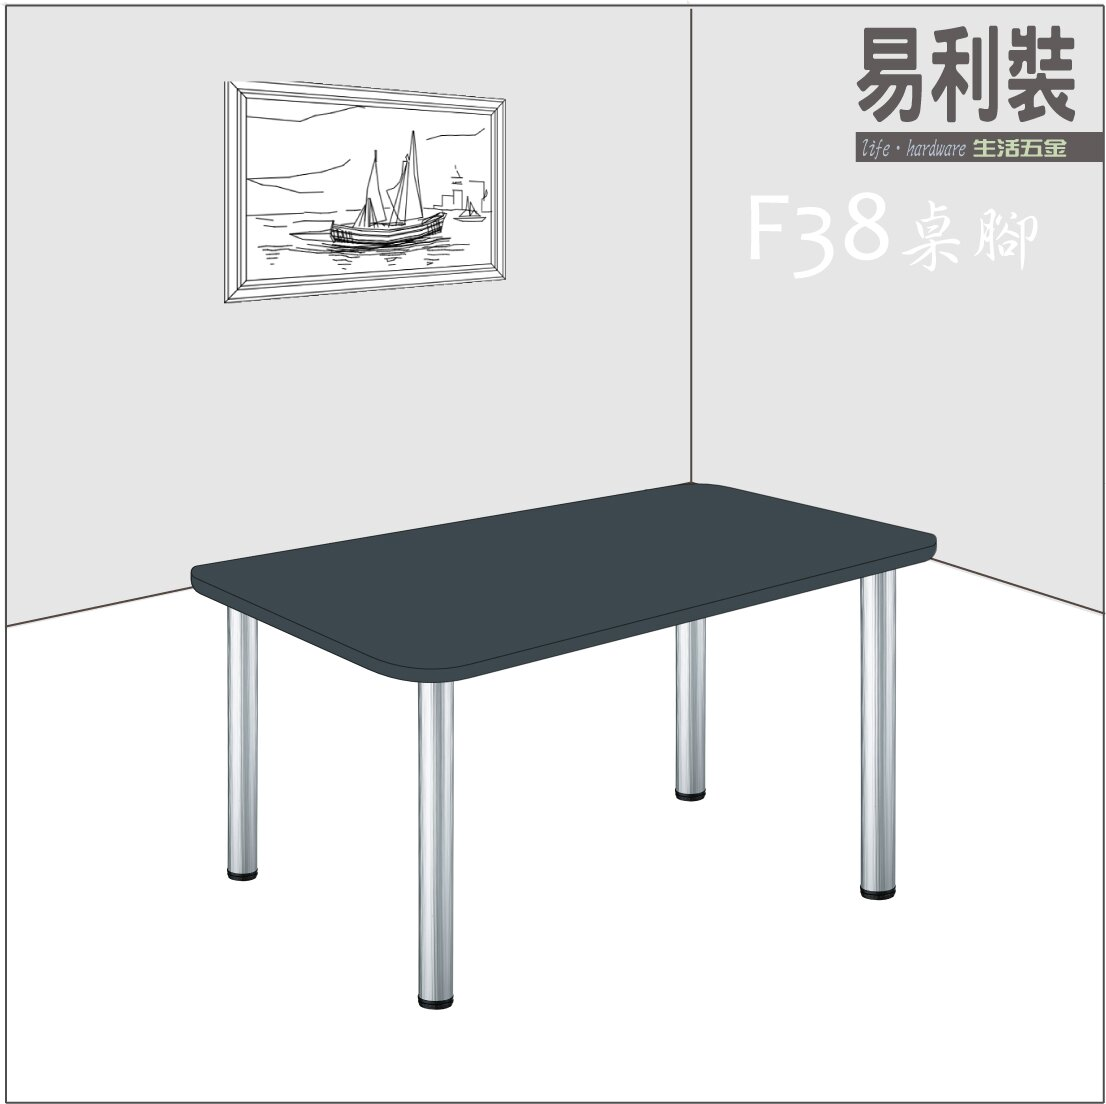 【 EASYCAN  】F38-餐桌腳 易利裝生活五金 櫥櫃腳 衣櫃腳 鞋櫃腳 書櫃腳 房間 臥房 衣櫃 小資族 辦公家具 系統家具 4